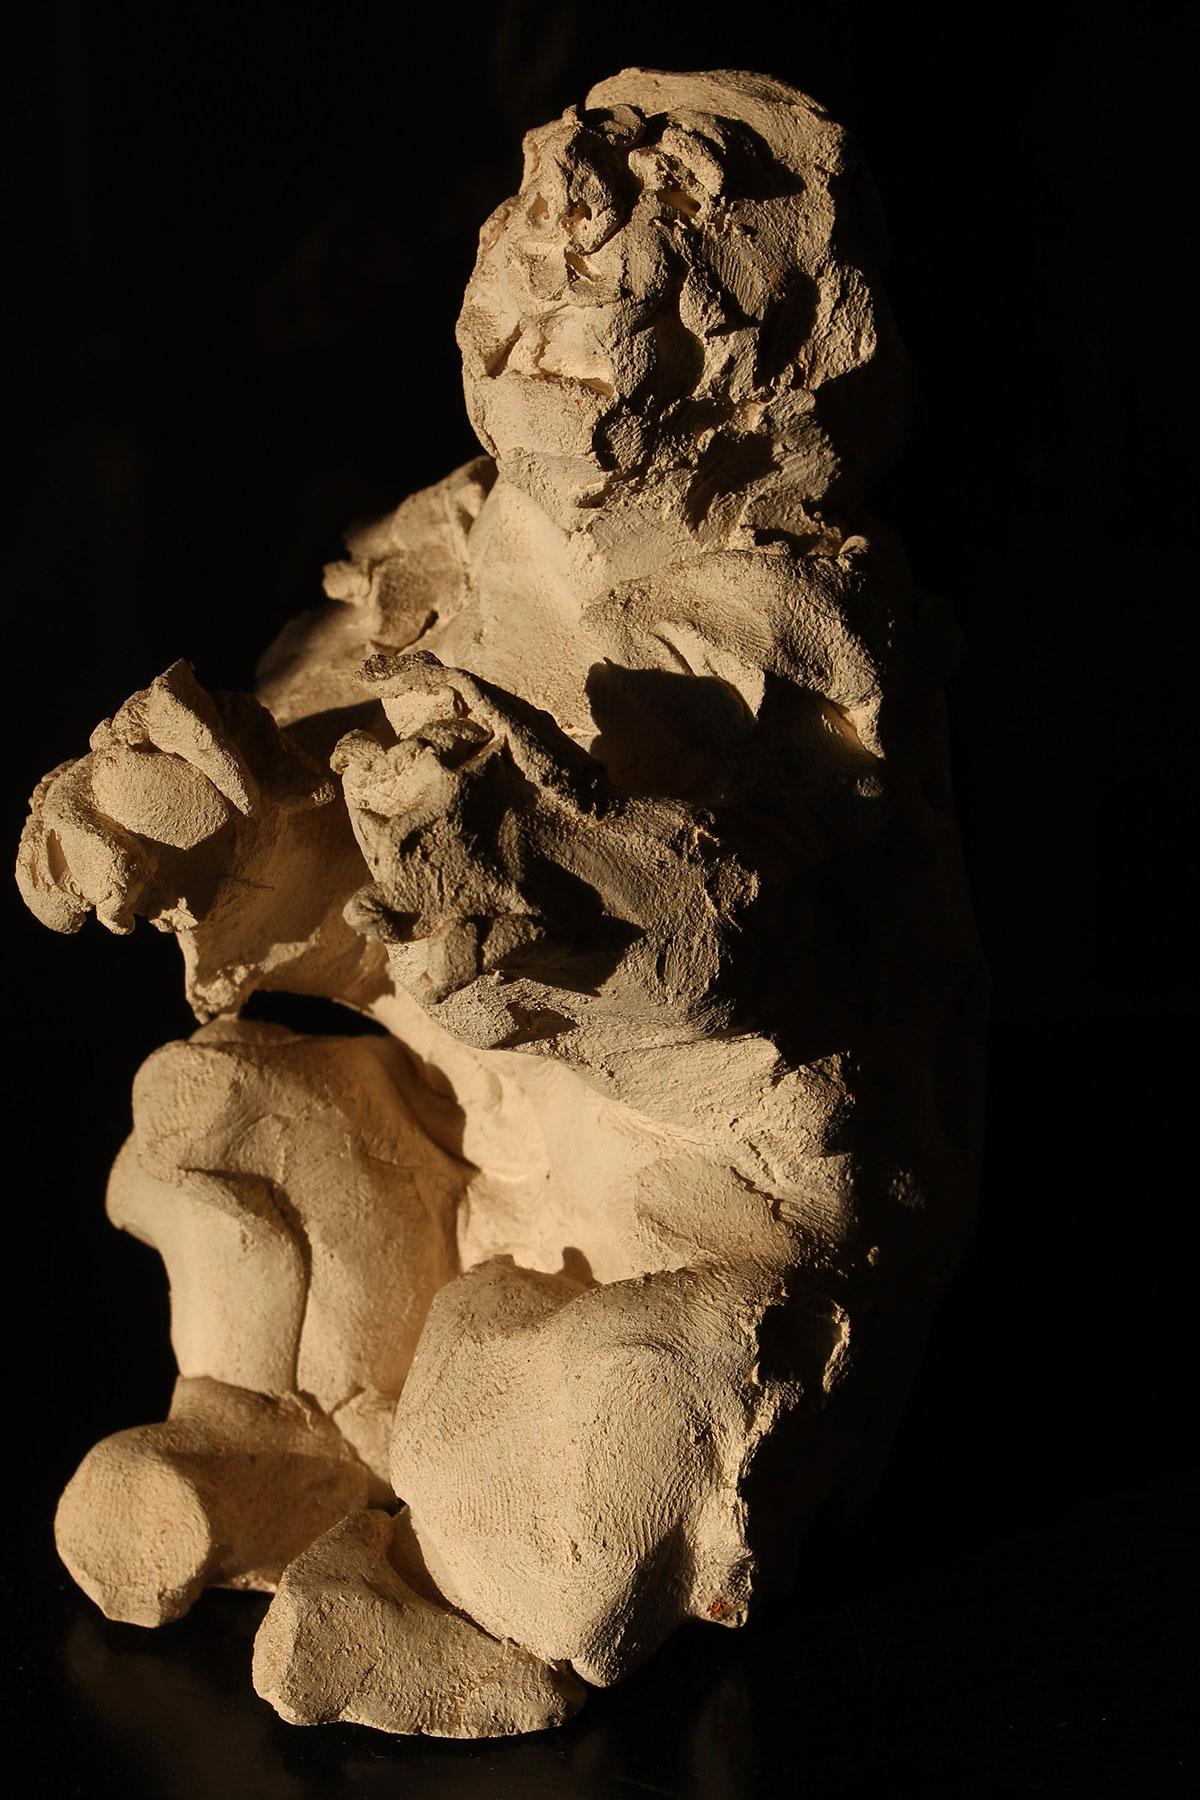 Homme accroupi, 2009, terre cuite, 13 x 8 cm.